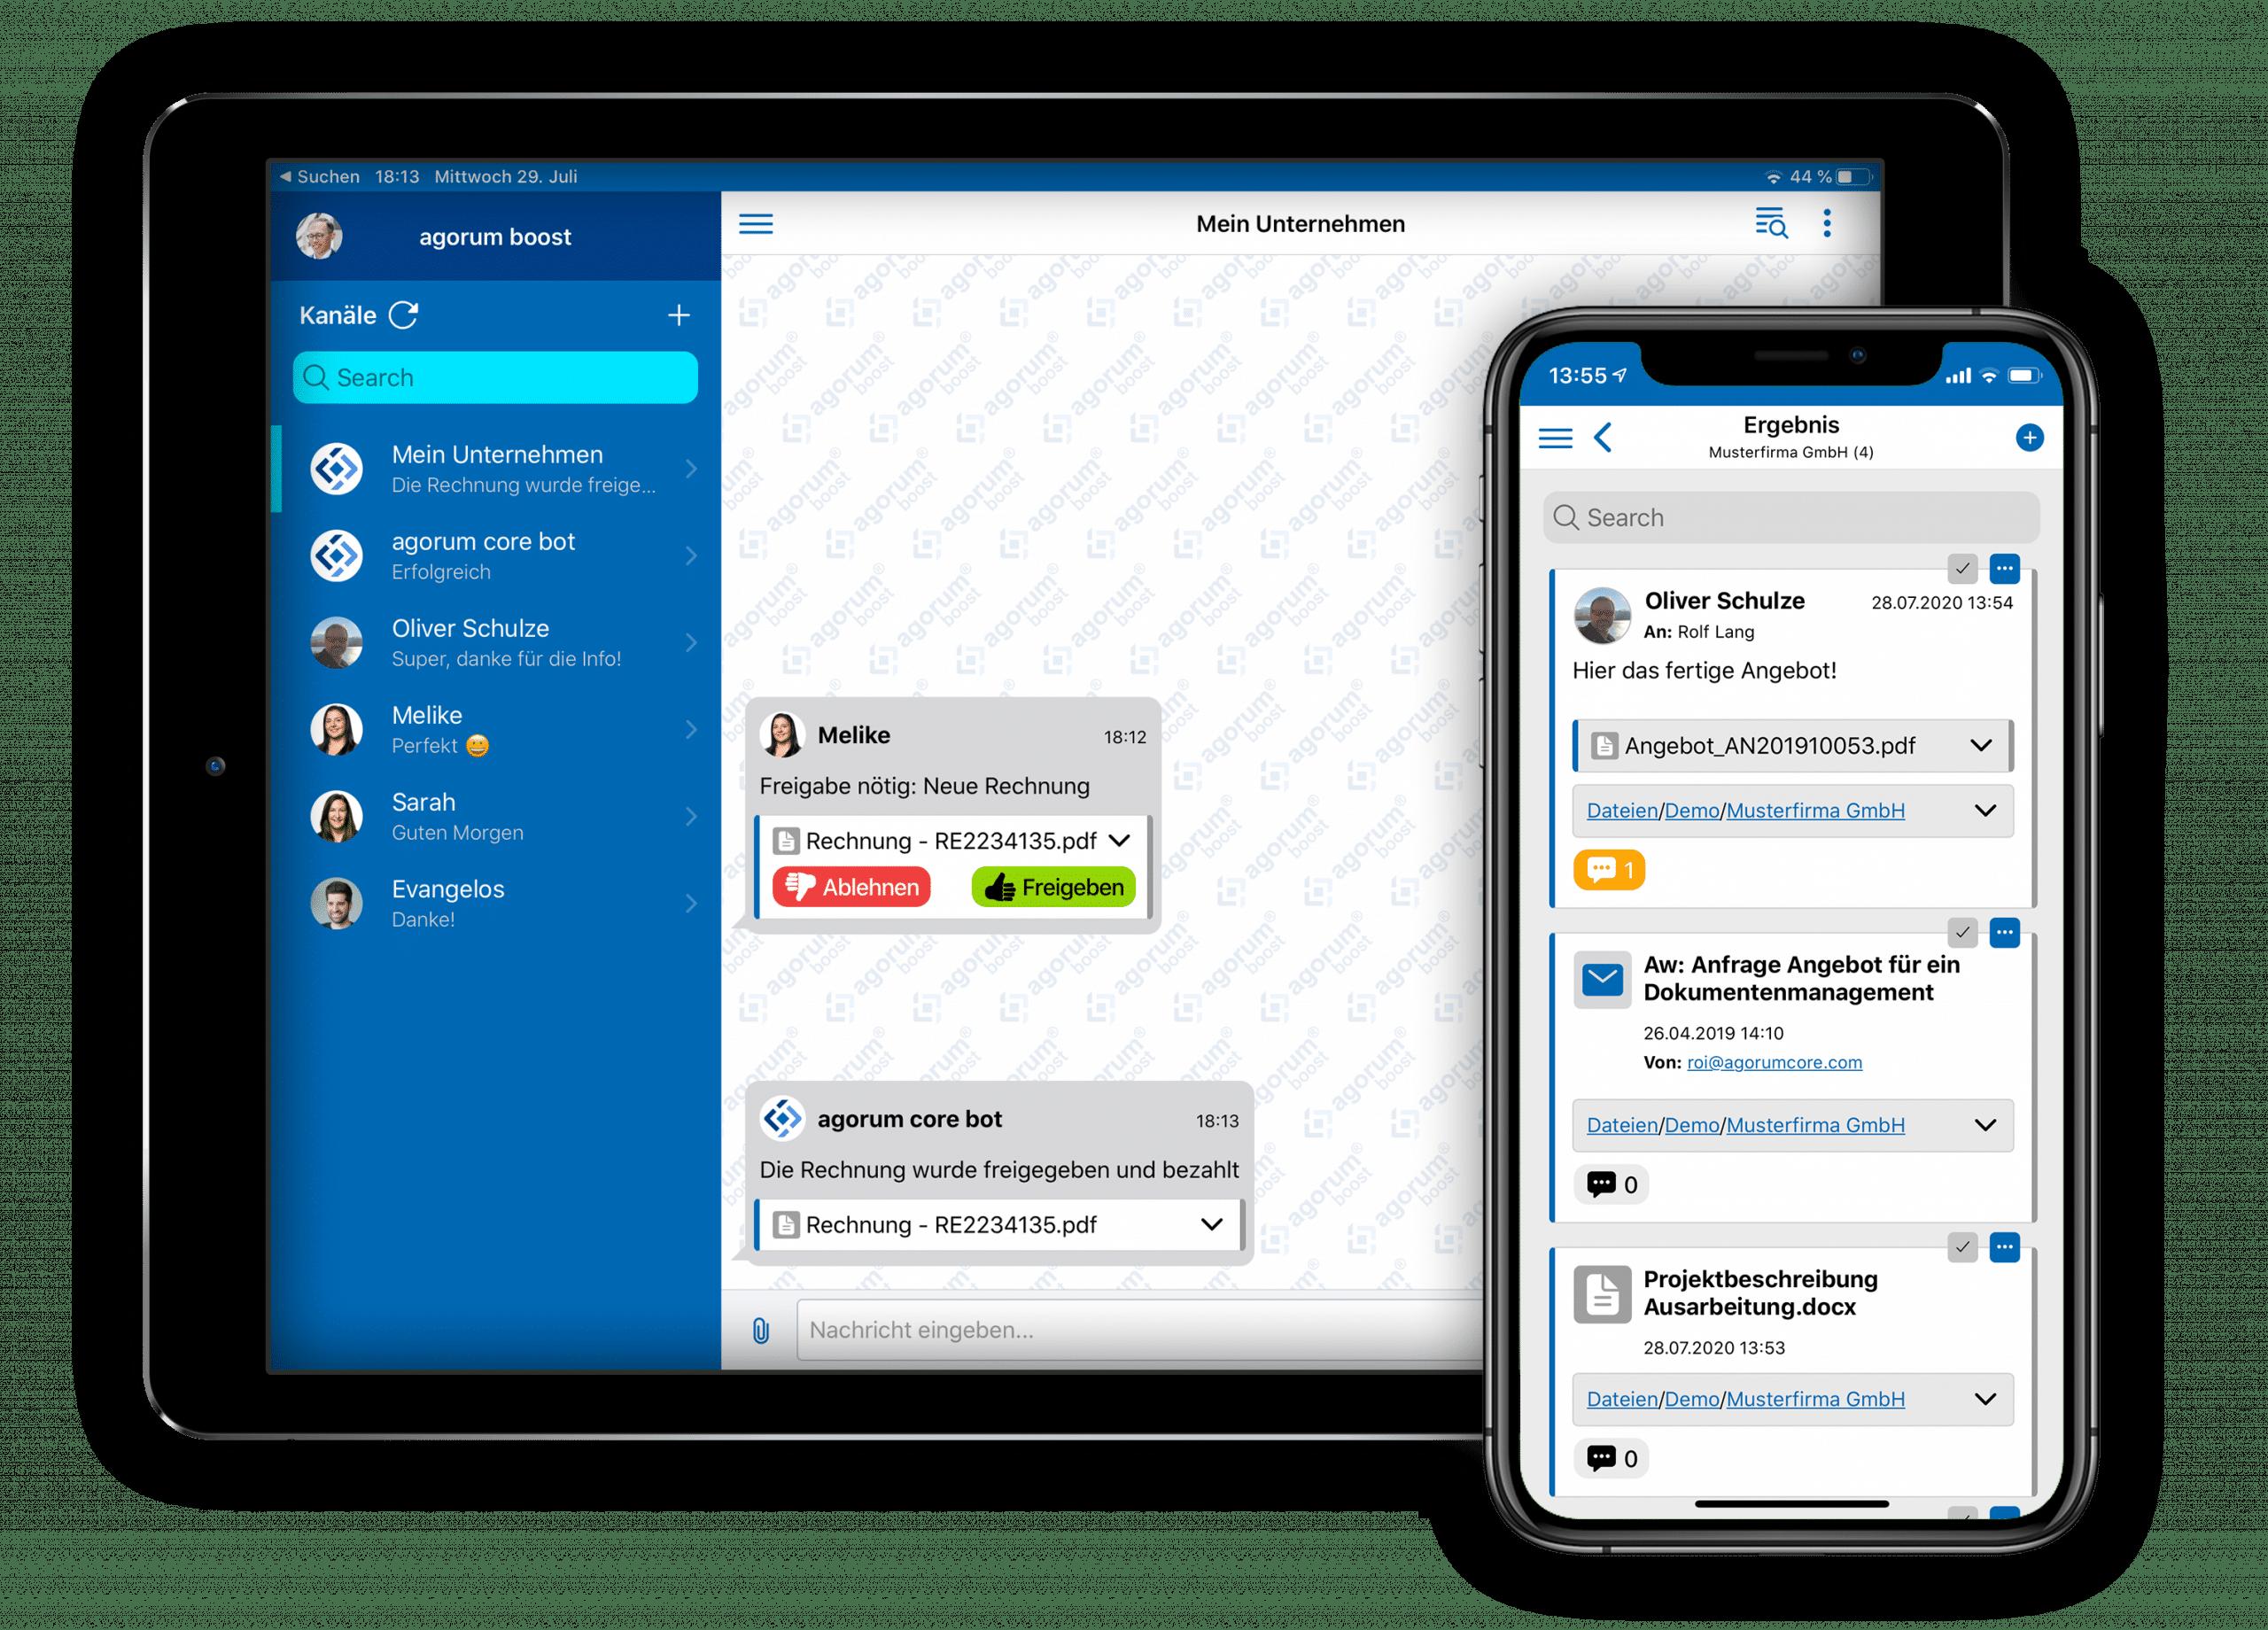 Open Source Dokumentenmanagement - mobil Arbeiten mit agorum boost